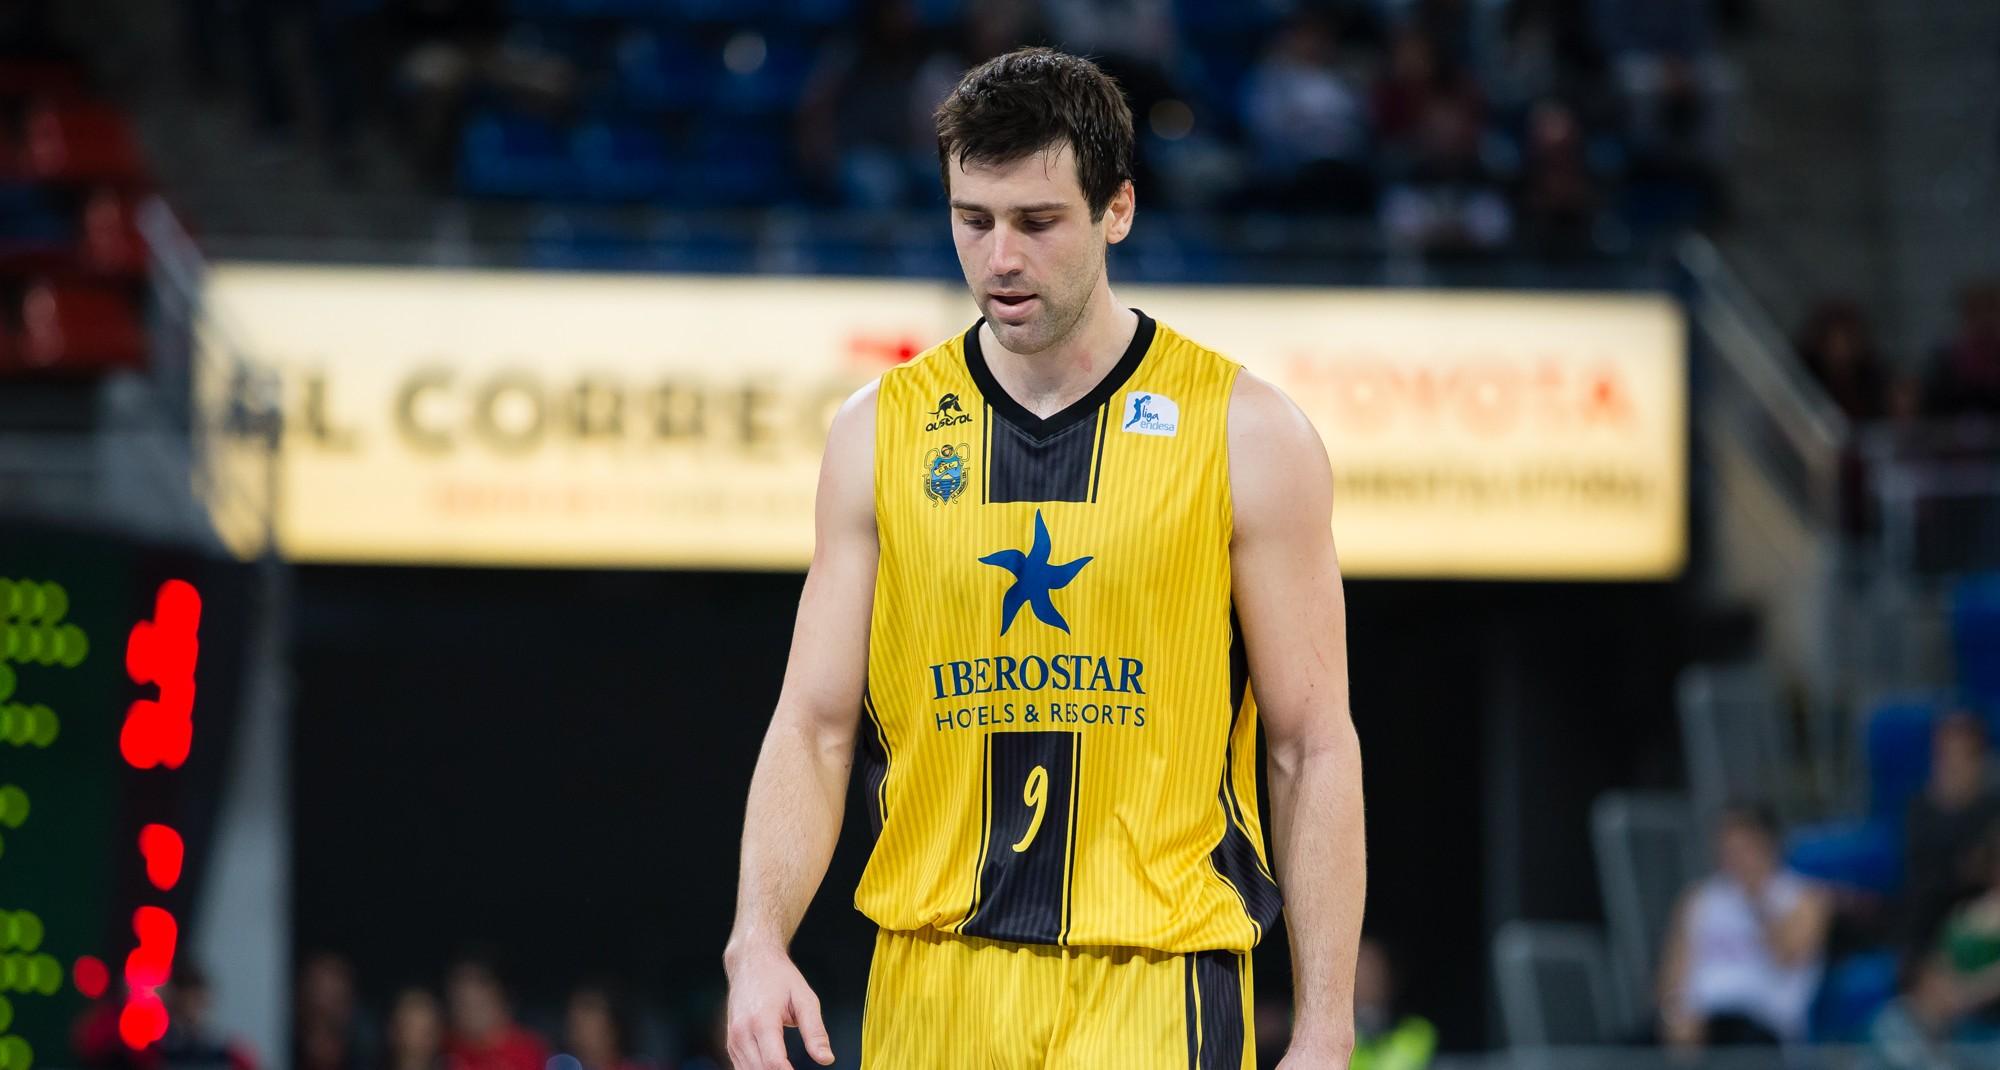 Blagota Sekulic, jugador de la Jornada 9 de la Liga Endesa